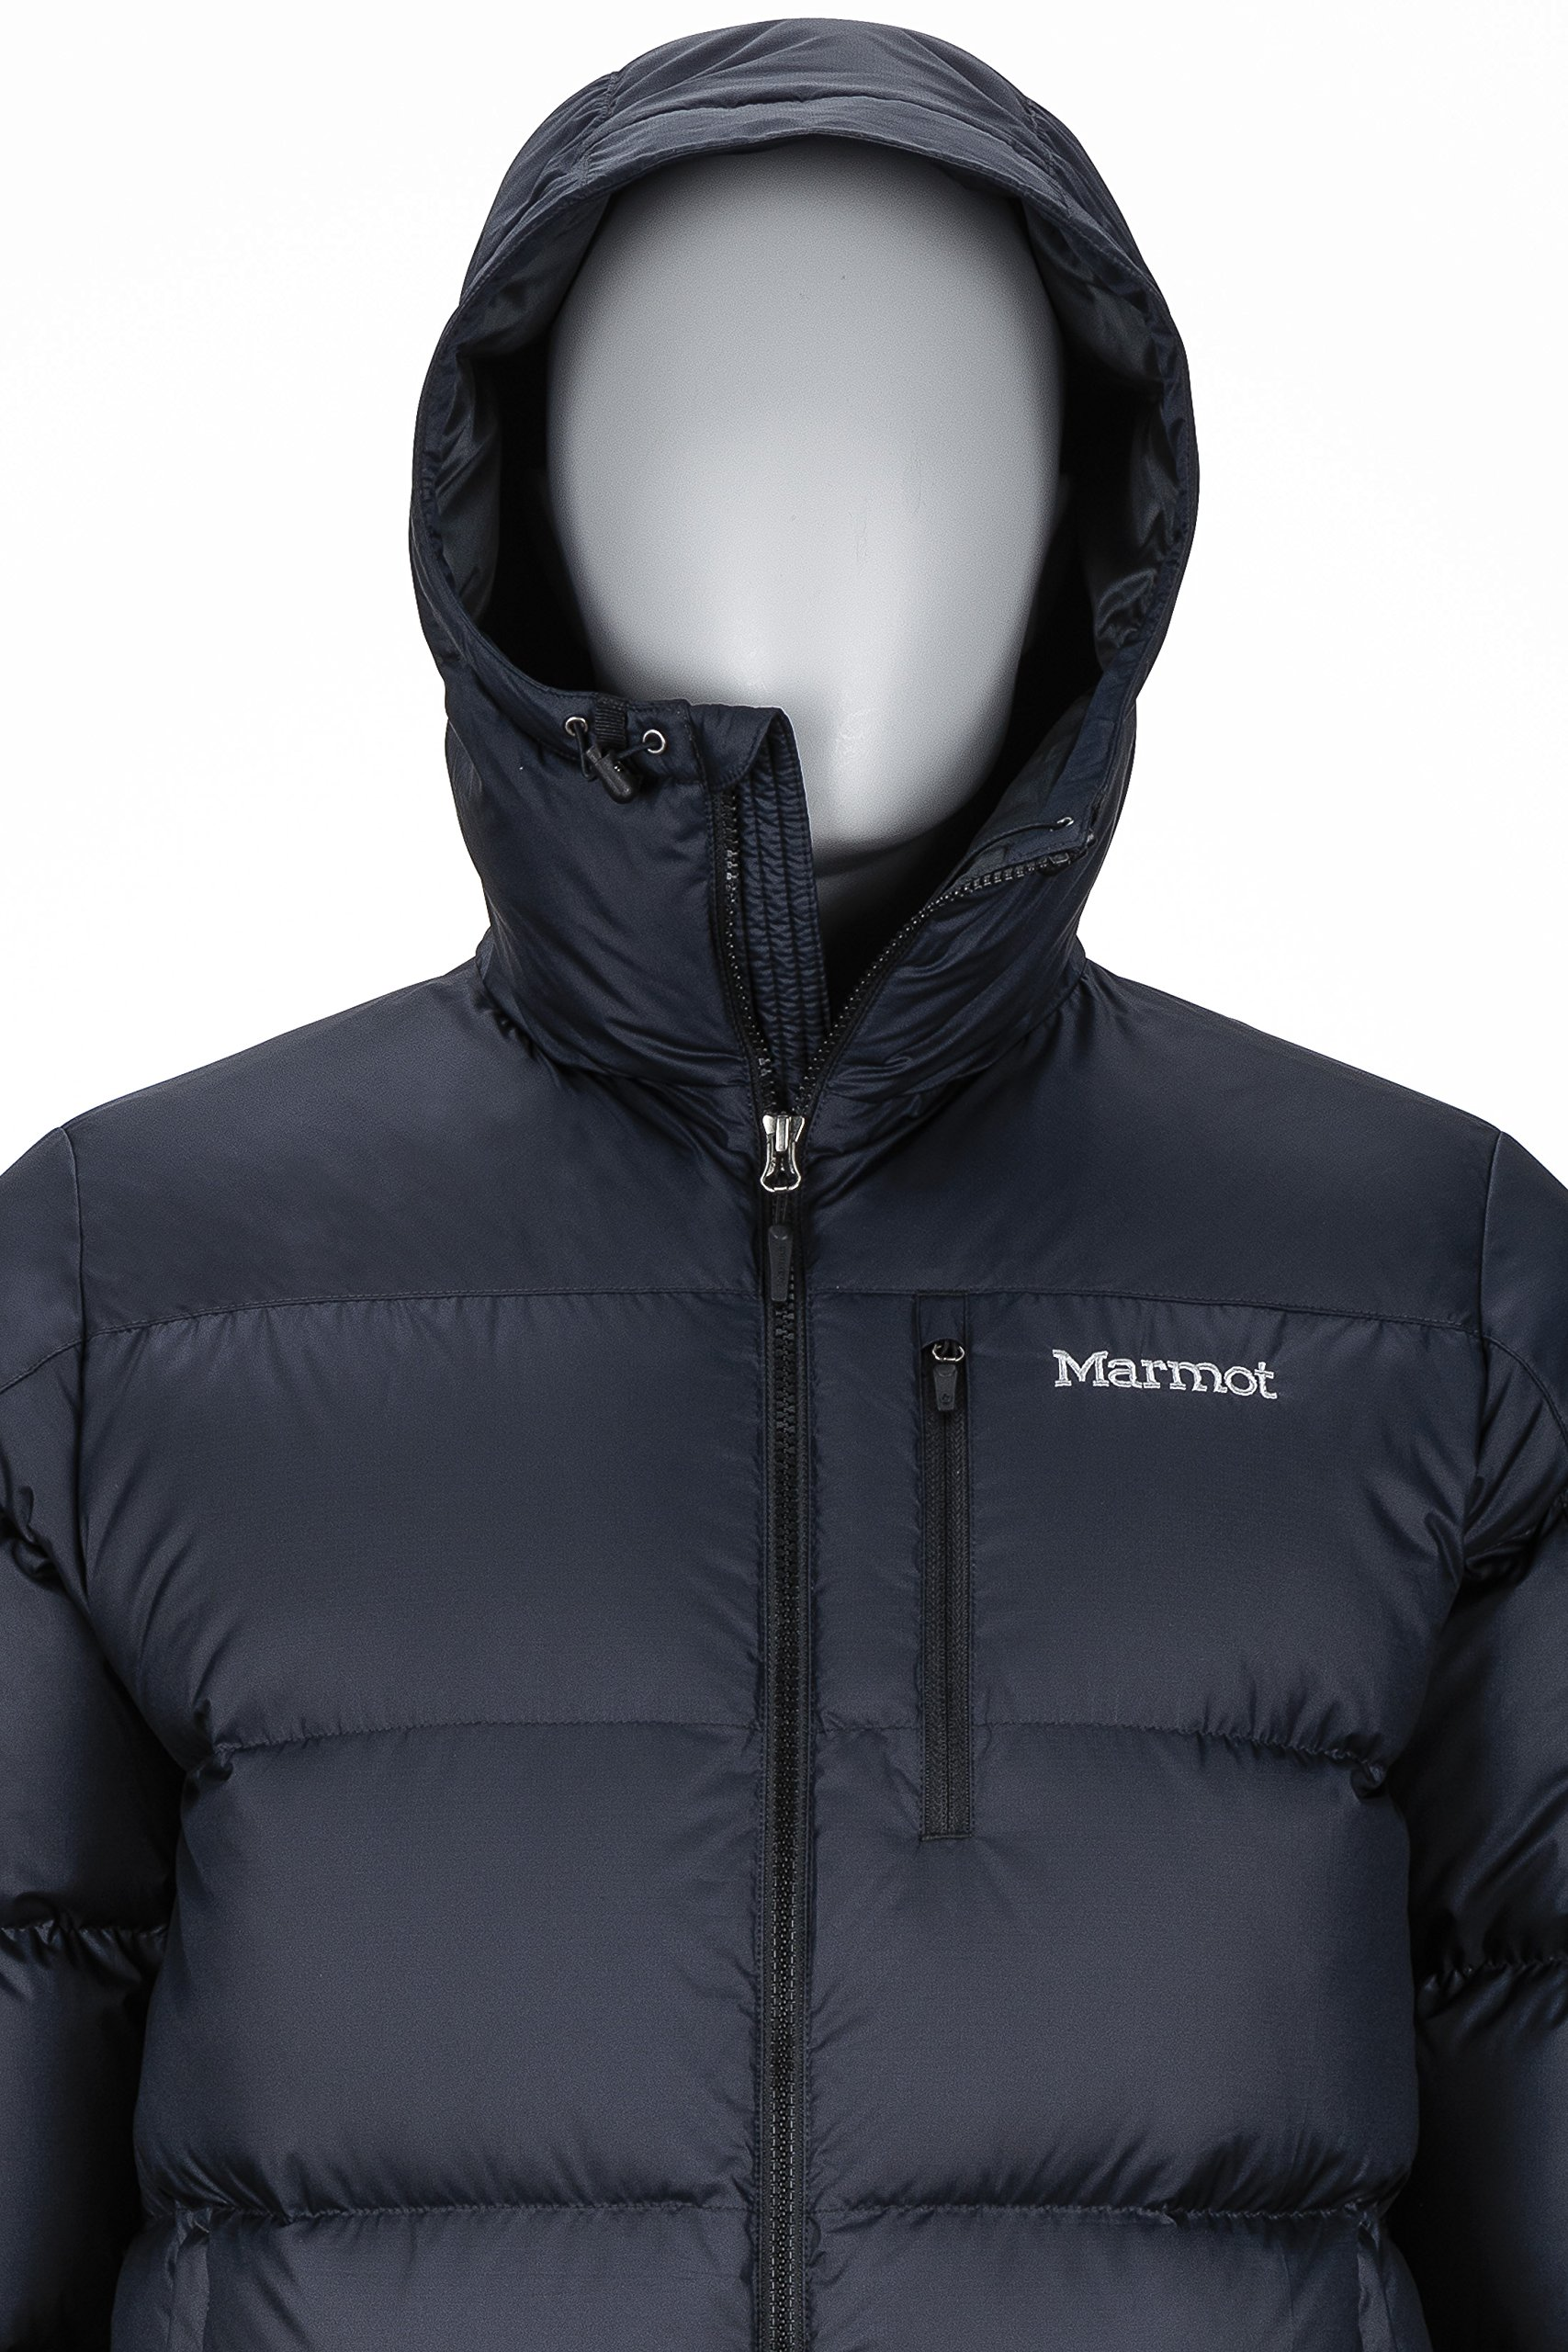 918nfJ8DdFL - Marmot Guides Down Winter Puffer Jacket with Hood, Men, 700 Fill Power Down